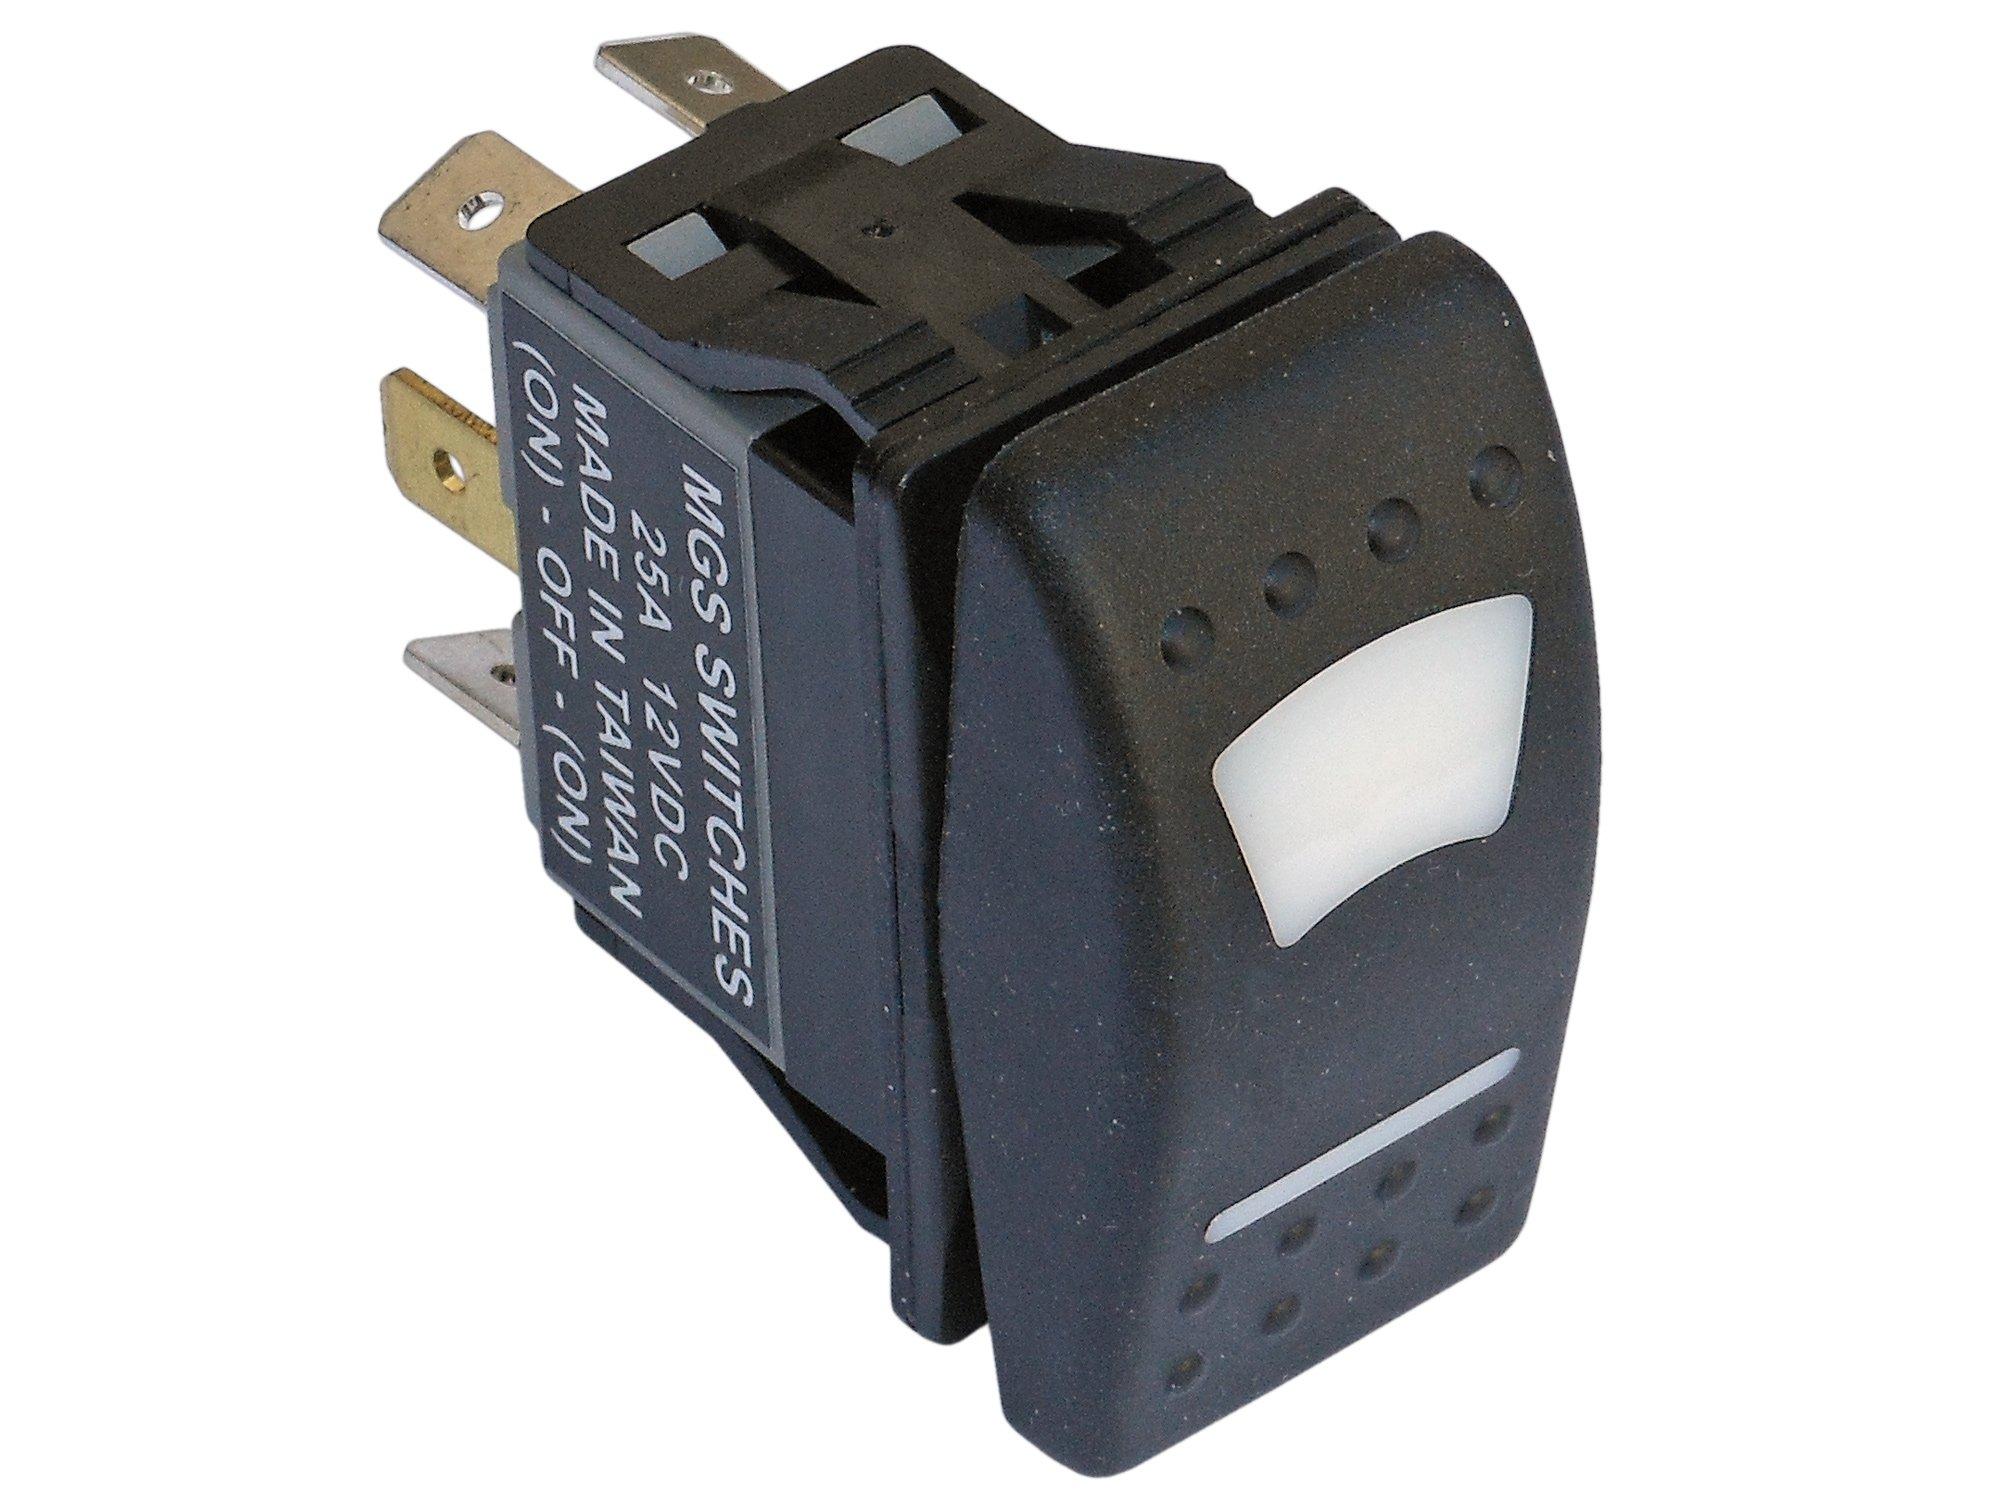 Five Oceans 6 Pin LED Rocker Switch 12V w/Light for Boat FO-3015